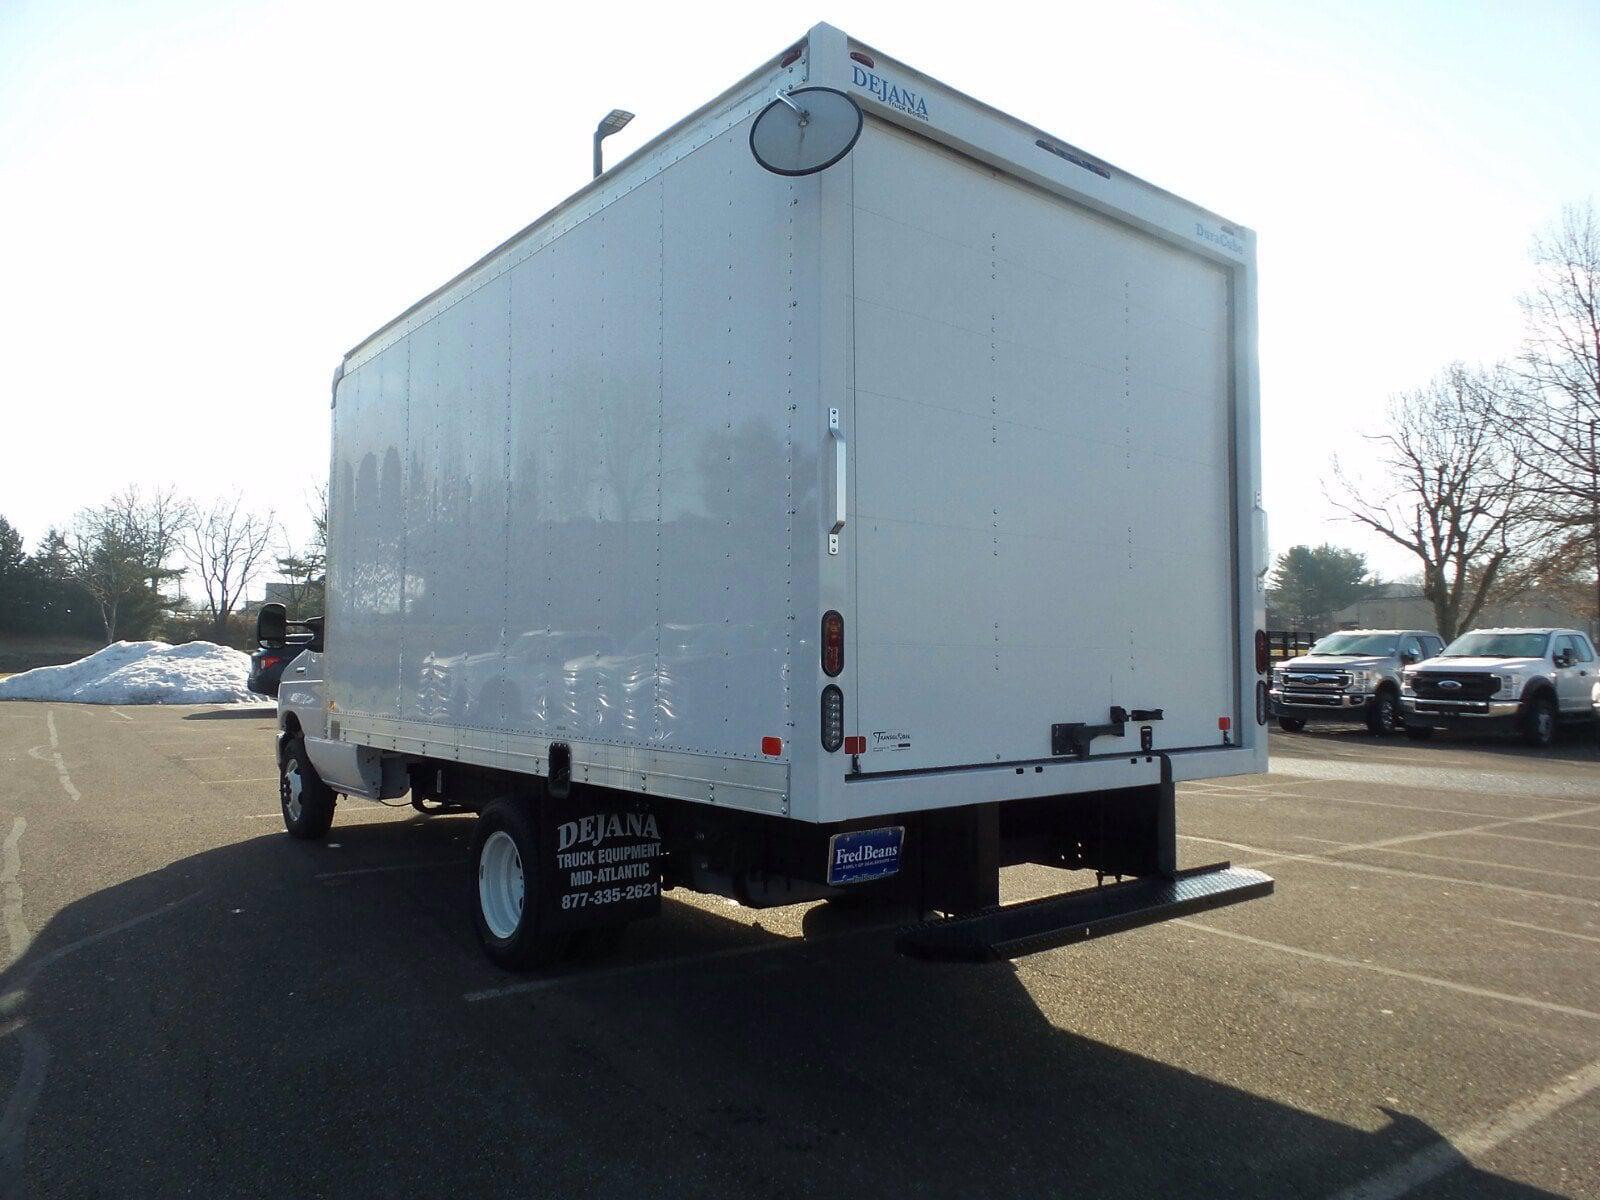 2021 Ford E-350 4x2, Cutaway Van #FU1095 - photo 1